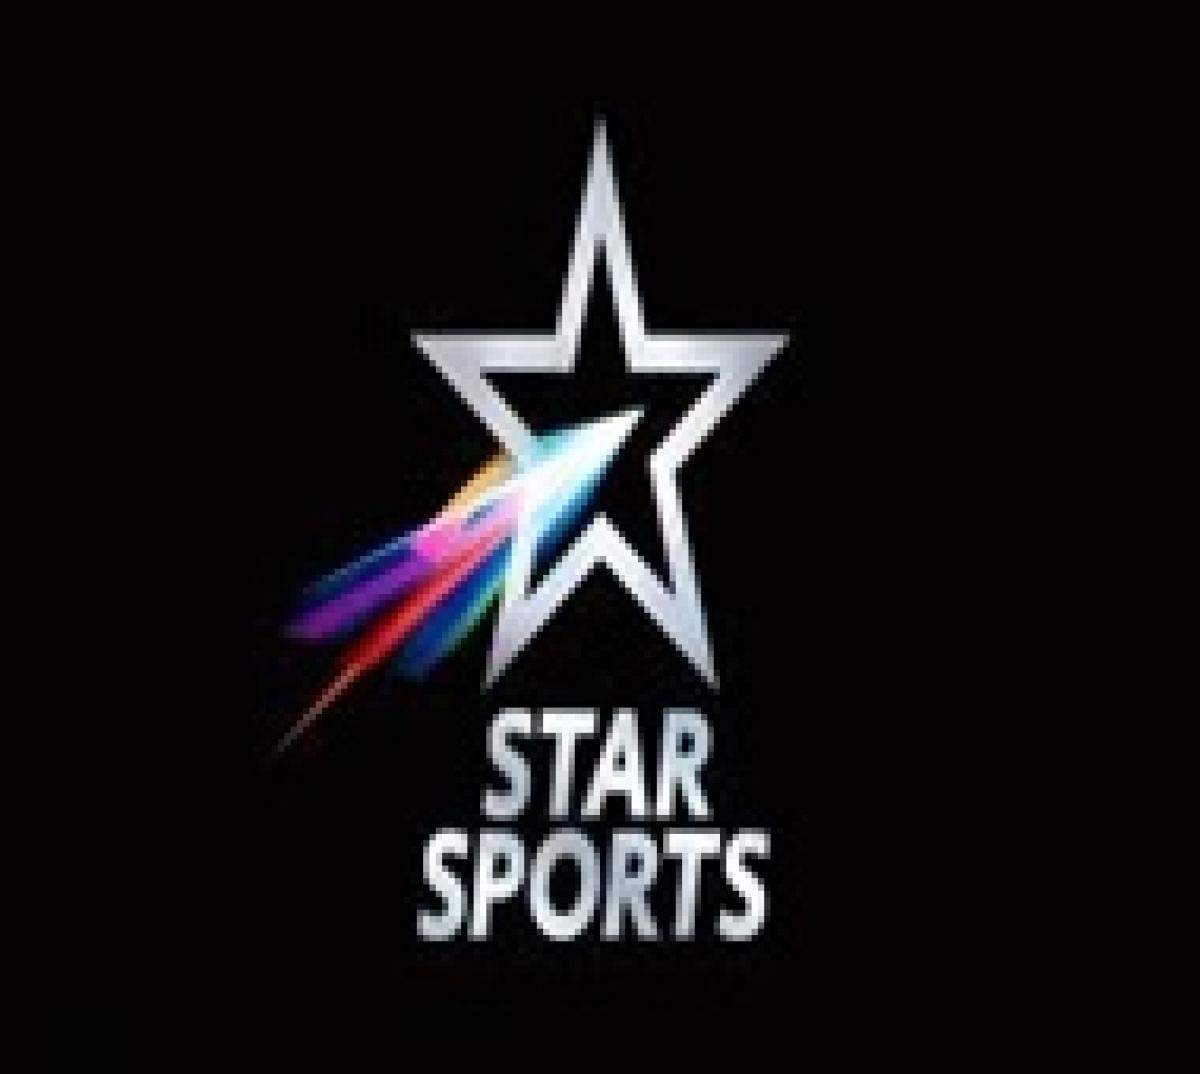 Star Sports campaigns for kabaddi at grassroot level